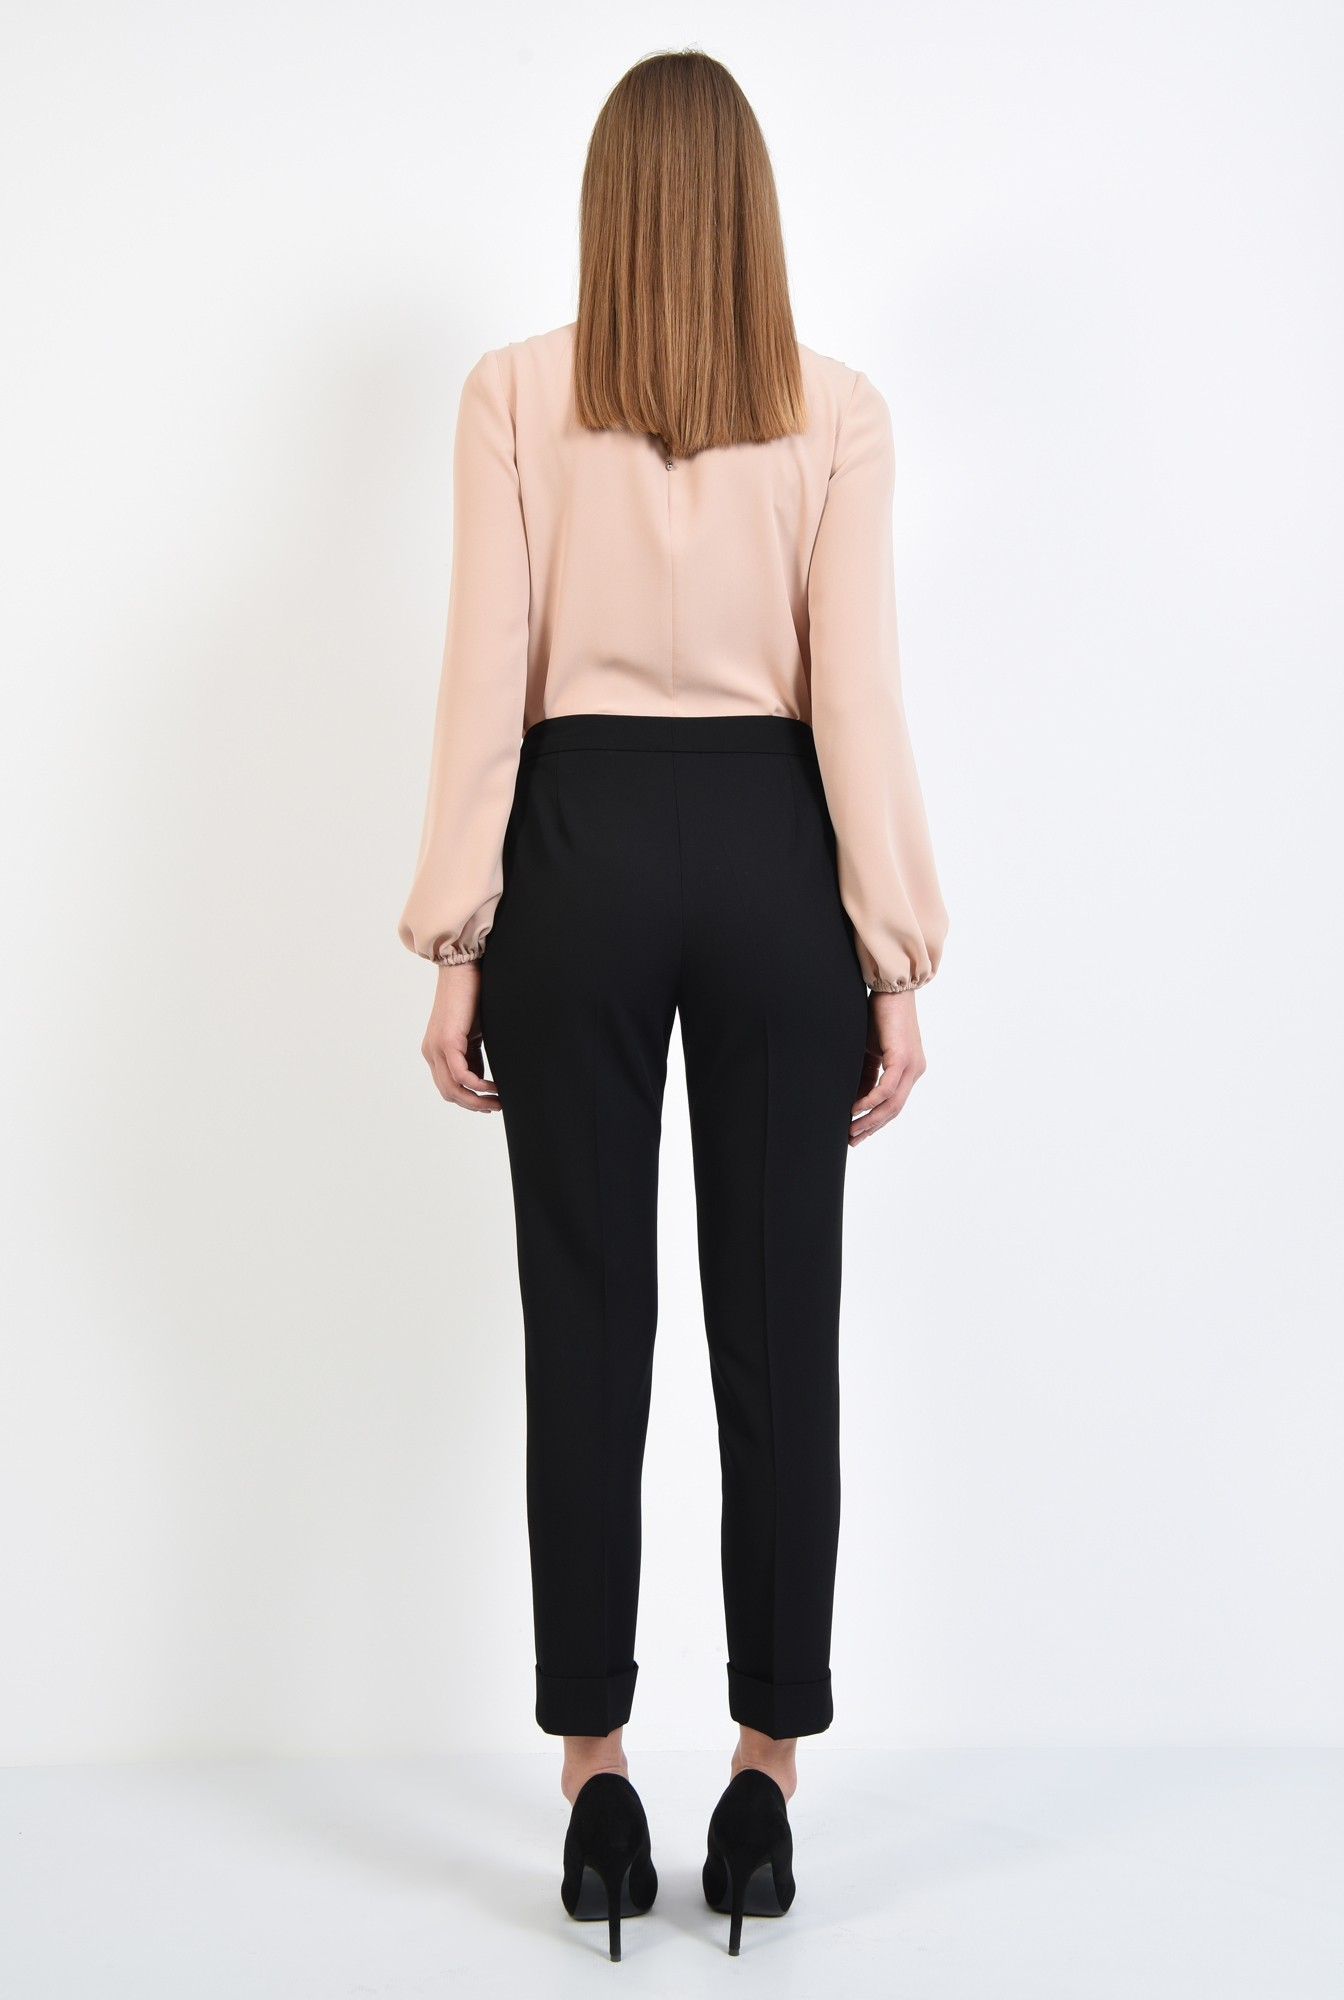 1 - pantaloni tigareta, cu mansete, cu talie medie, buzunare